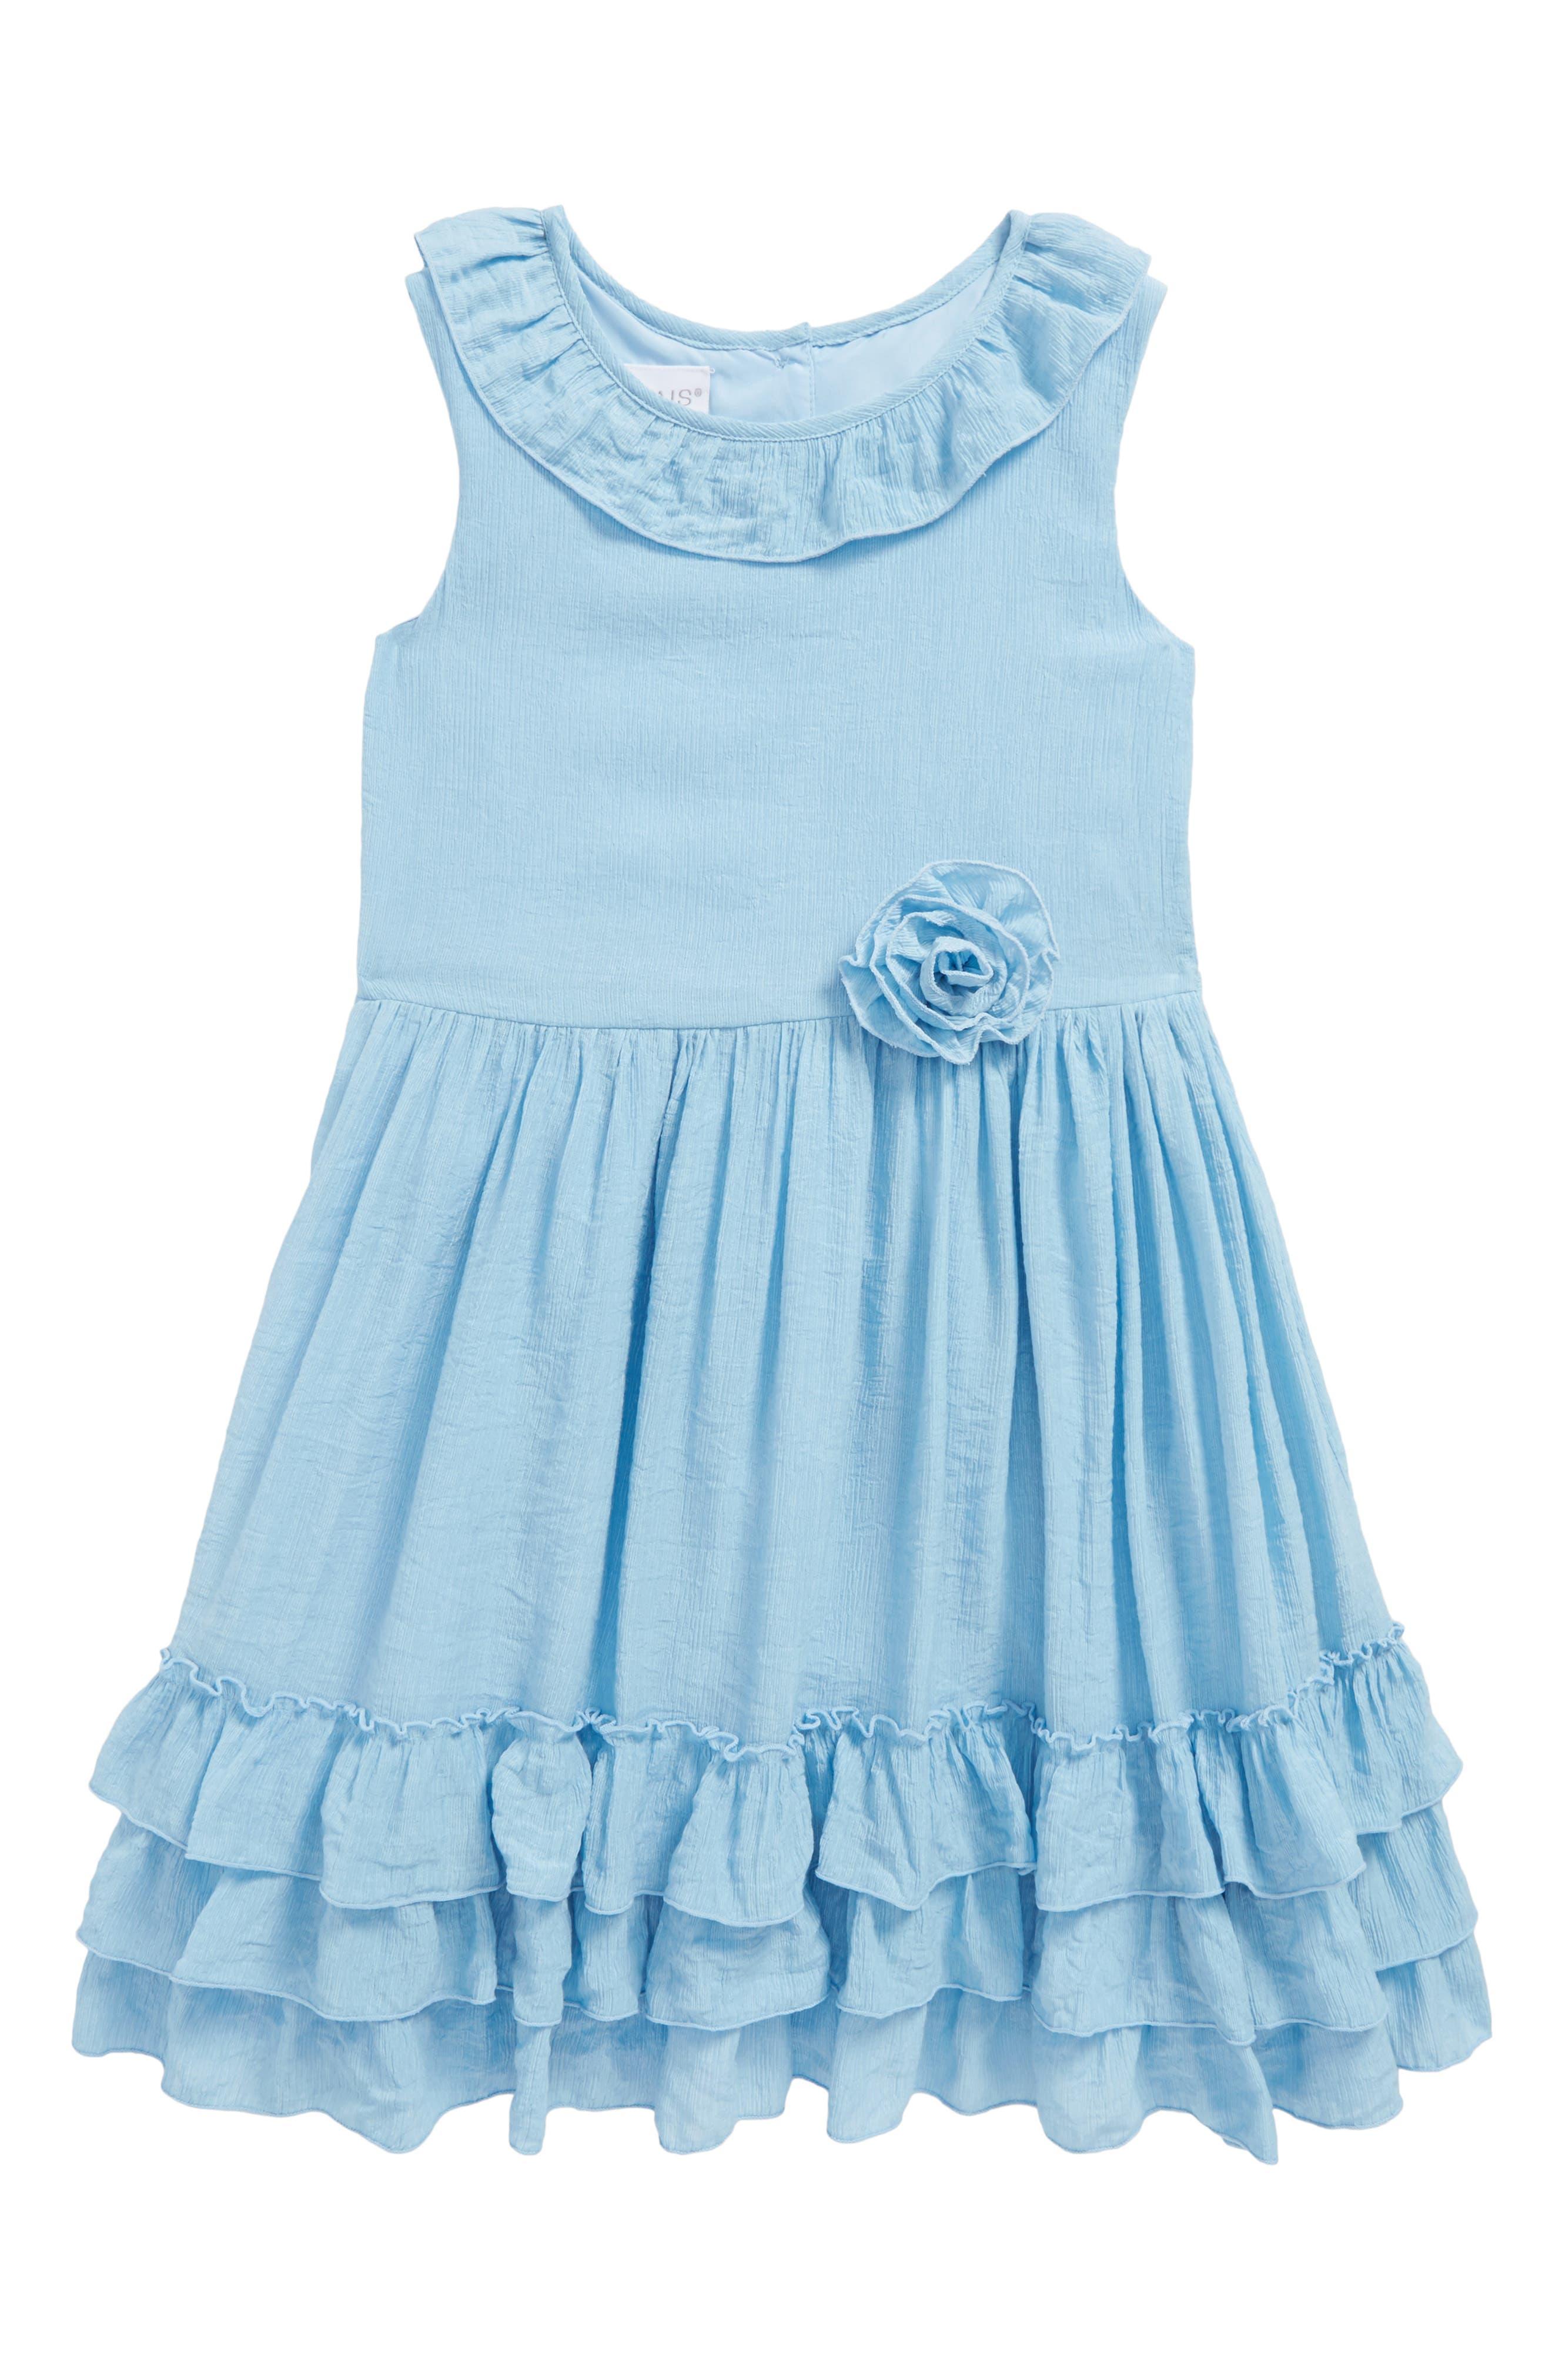 Ruffle Dress,                             Main thumbnail 1, color,                             Blue